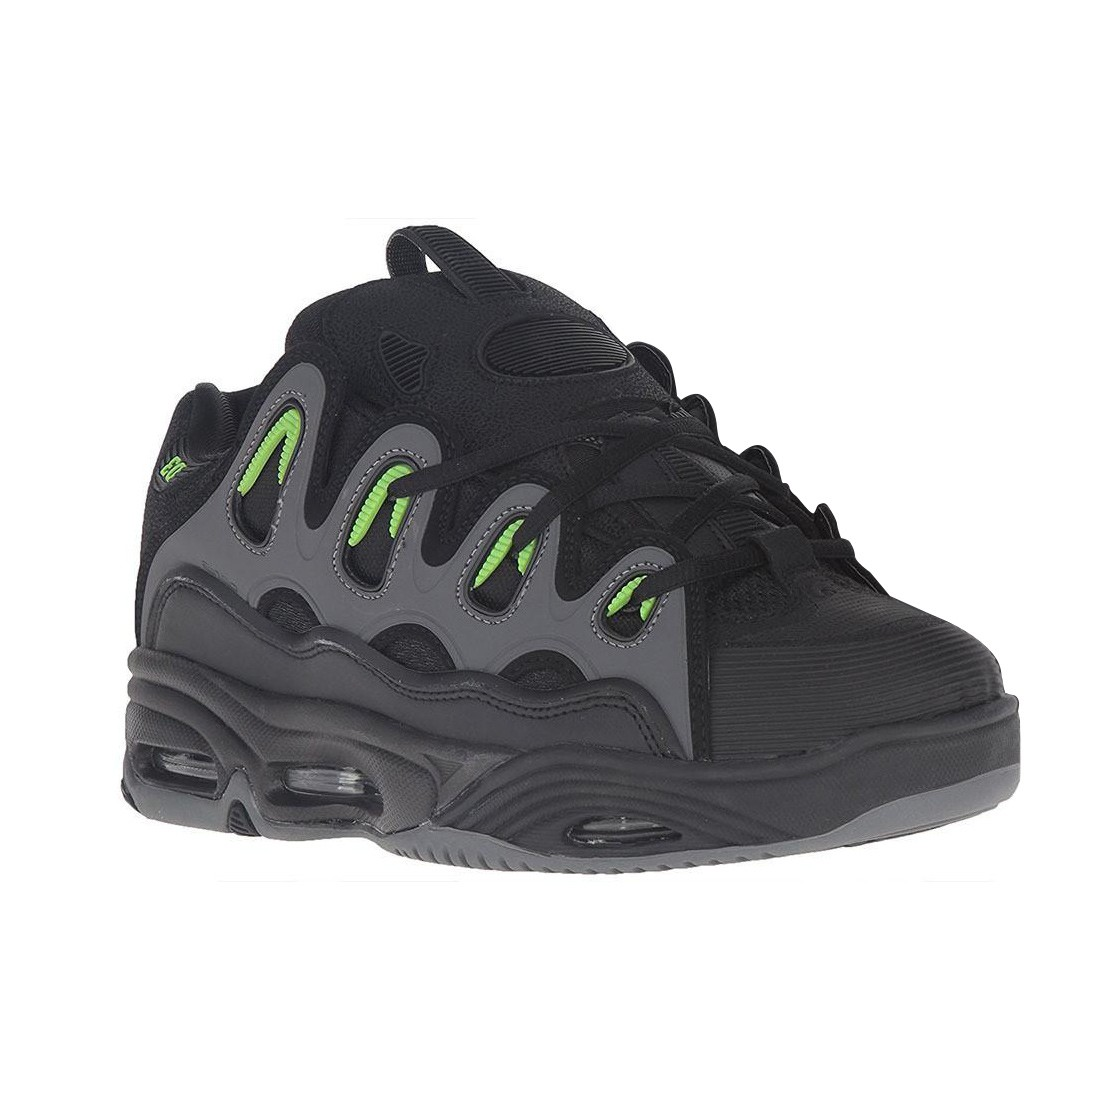 D3 2001 black green charcoal